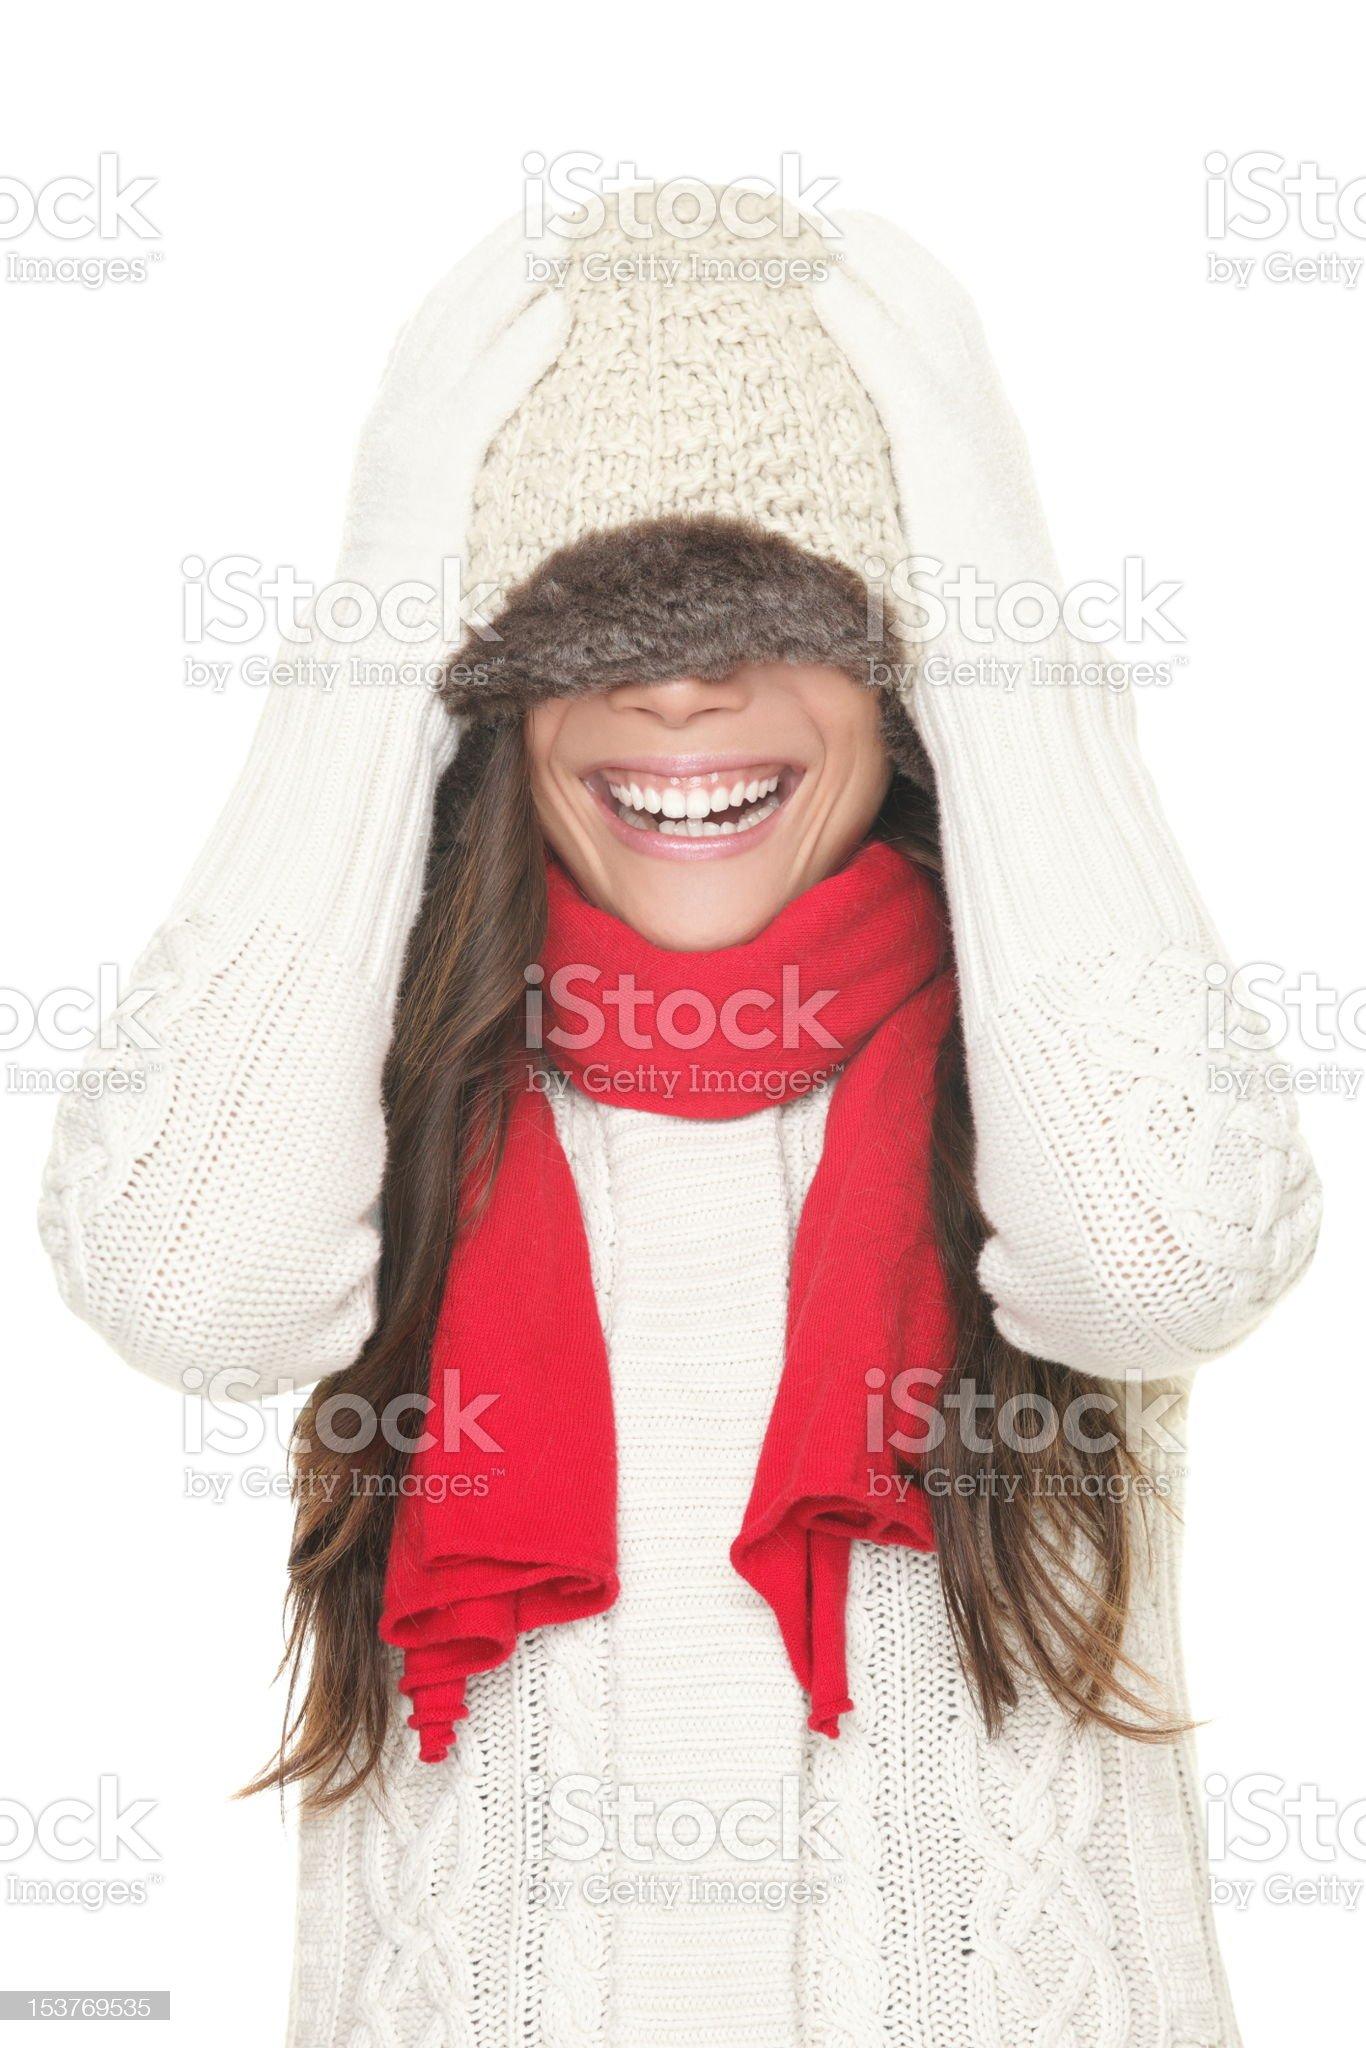 Winter playful woman royalty-free stock photo